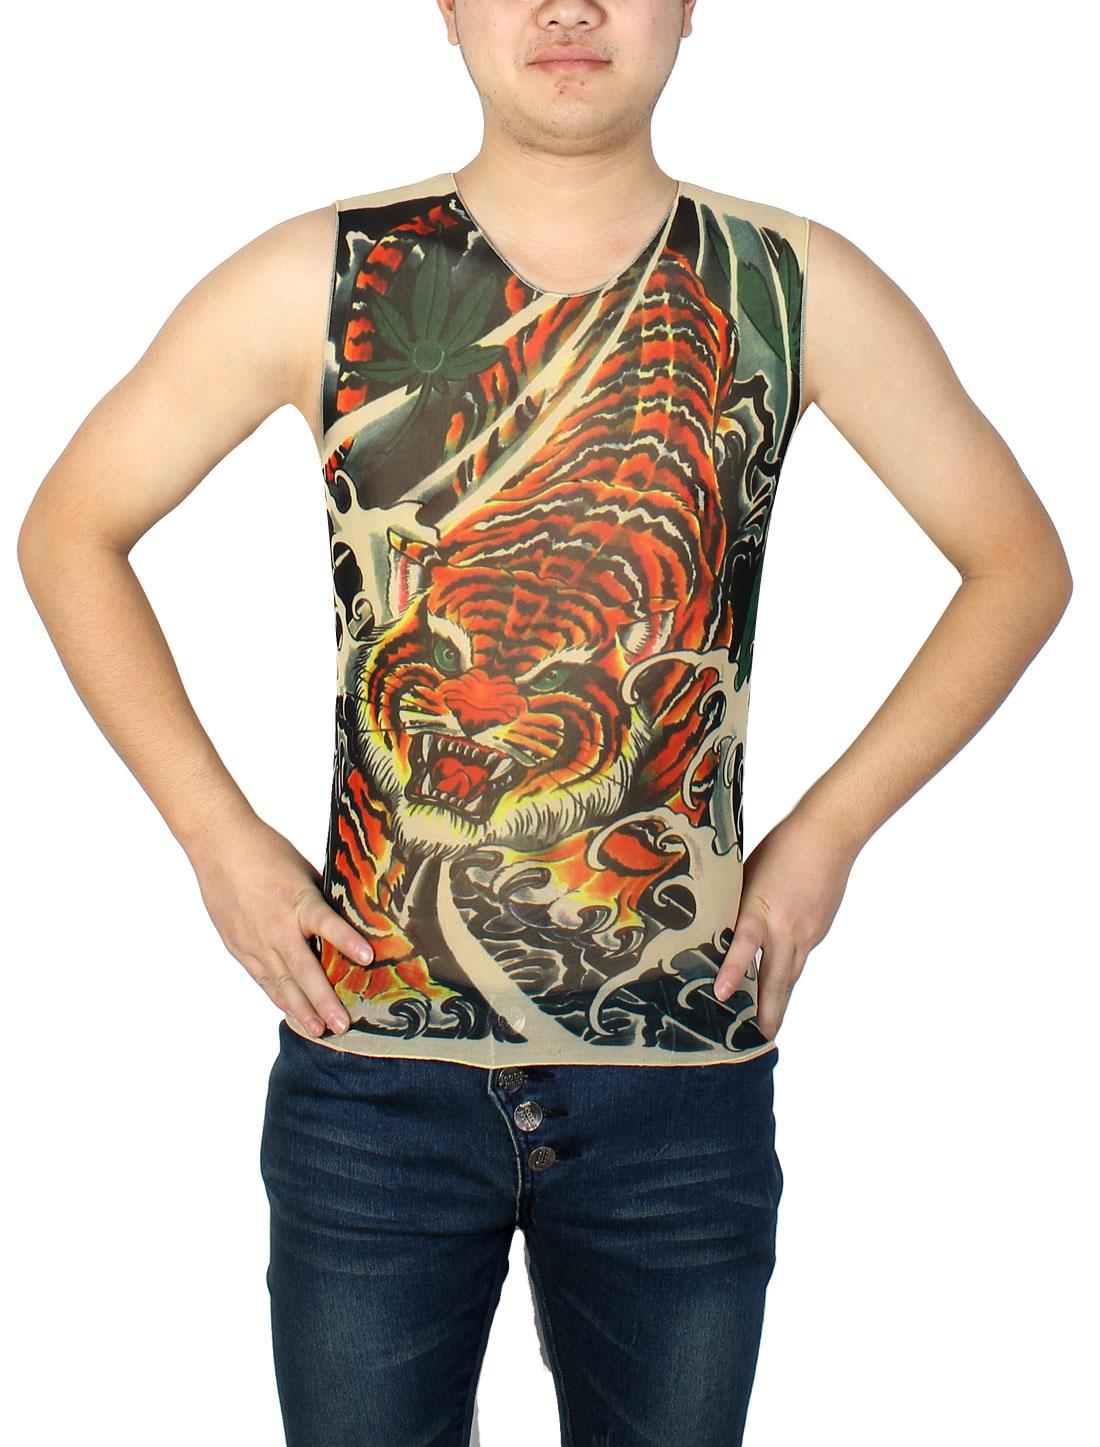 Round Neck Sleeveless Orange Red Tiger Print Semi Sheer Tattoo Vest S for Men